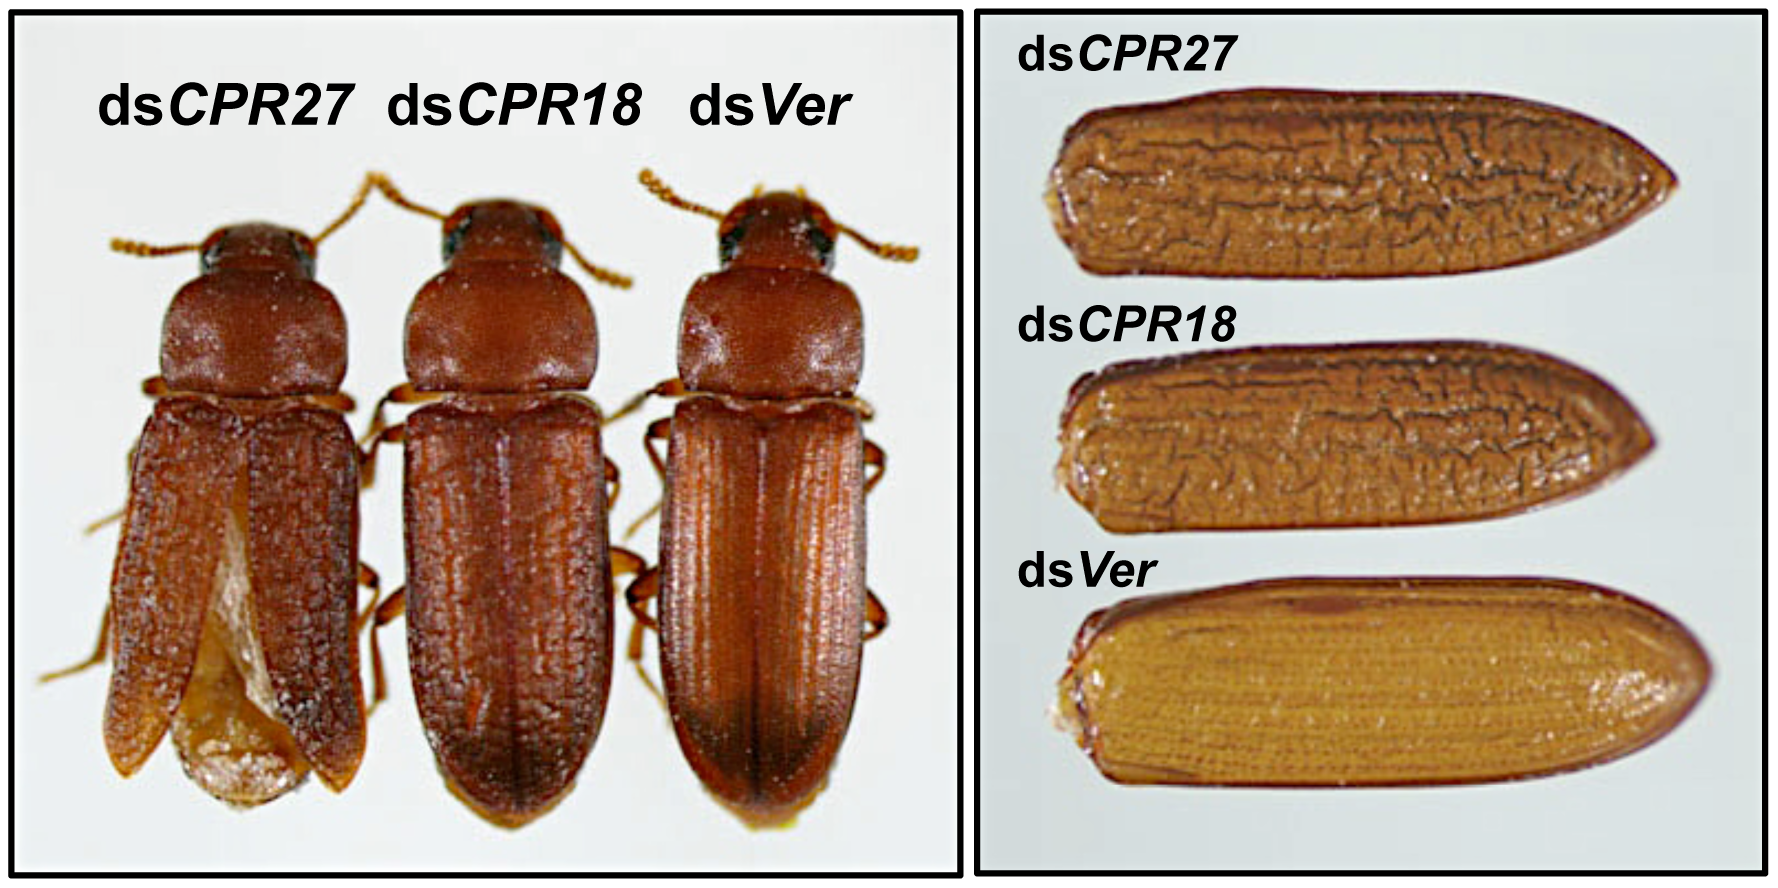 <i>T. castaneum</i> elytral defects produced by injection of dsRNAs for <i>TcCPR27</i> and <i>TcCPR18</i>.